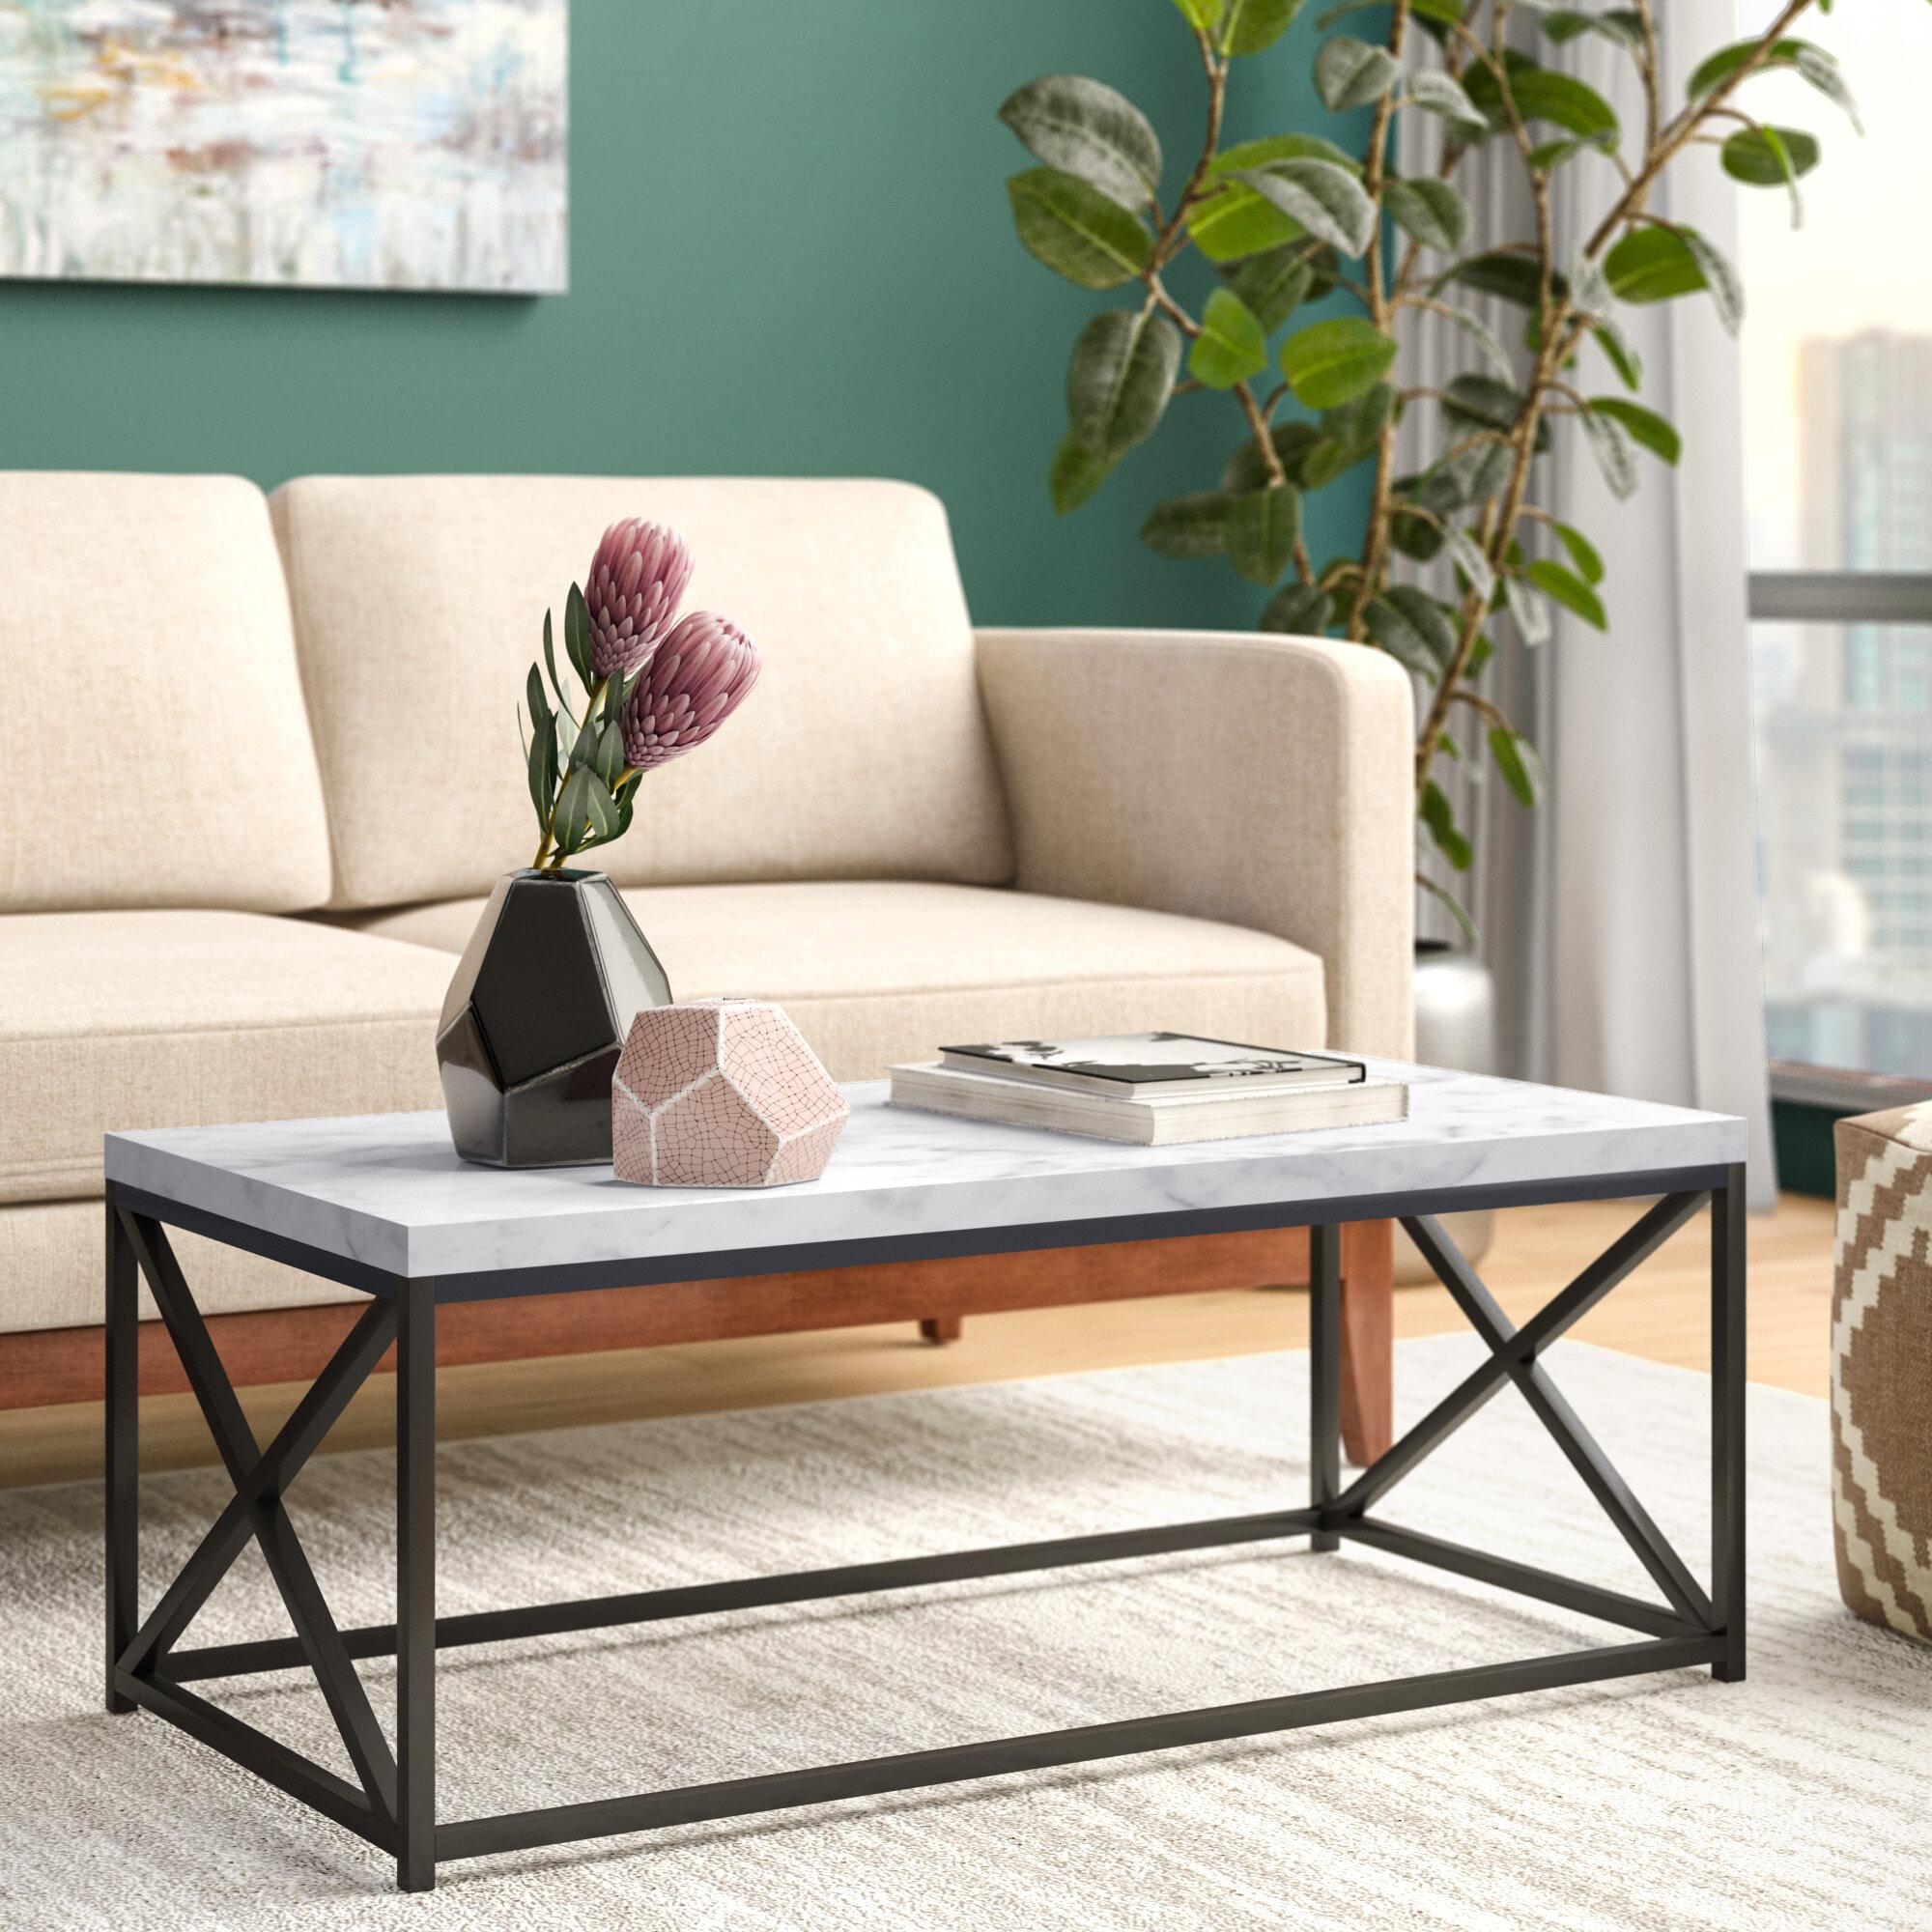 Black Frame Coffee Tables You Ll Love In 2021 Wayfair